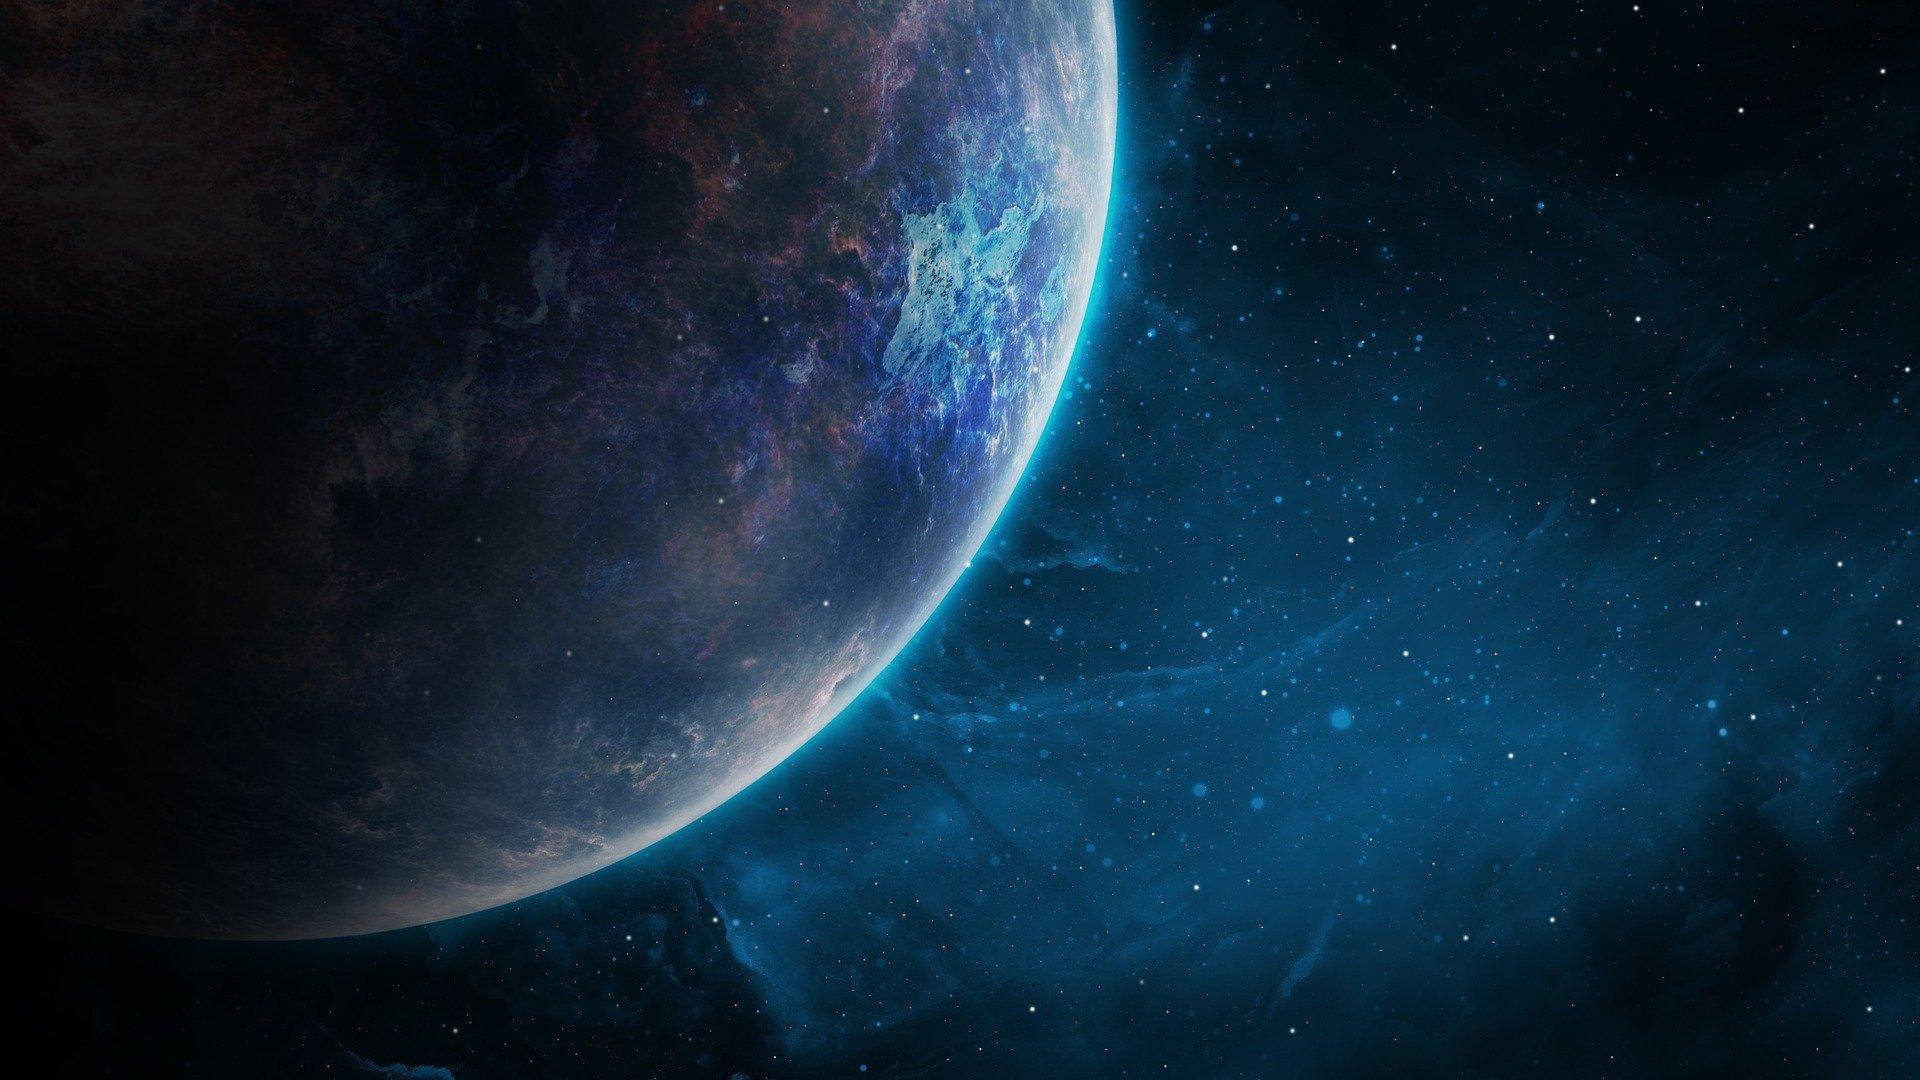 )° pianeta sistema solare Credits: Foto di Yuri_B